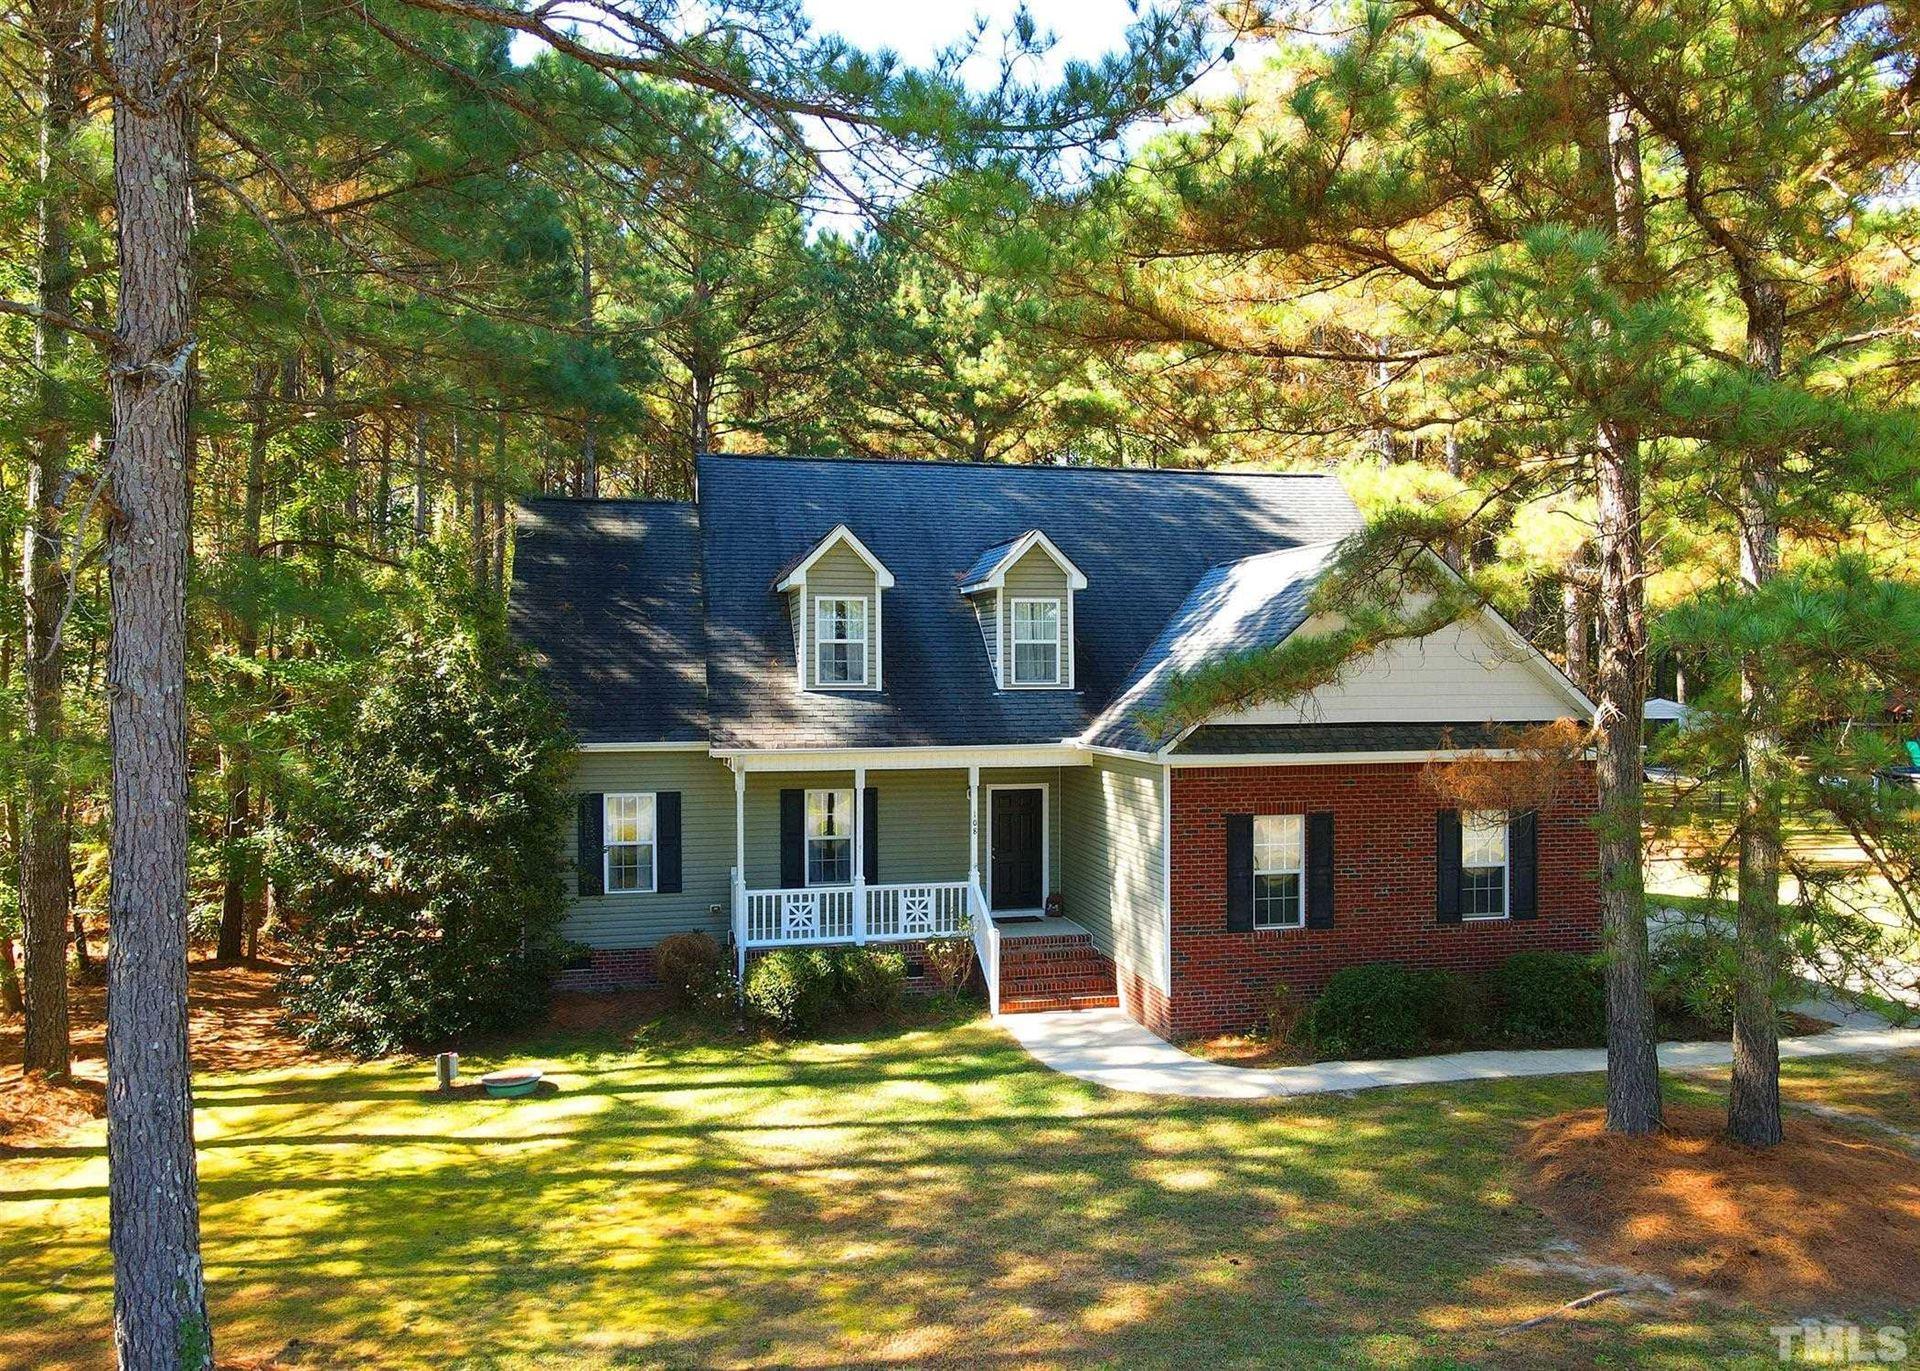 Photo of 108 Majestic Drive, Princeton, NC 27569-9211 (MLS # 2415794)